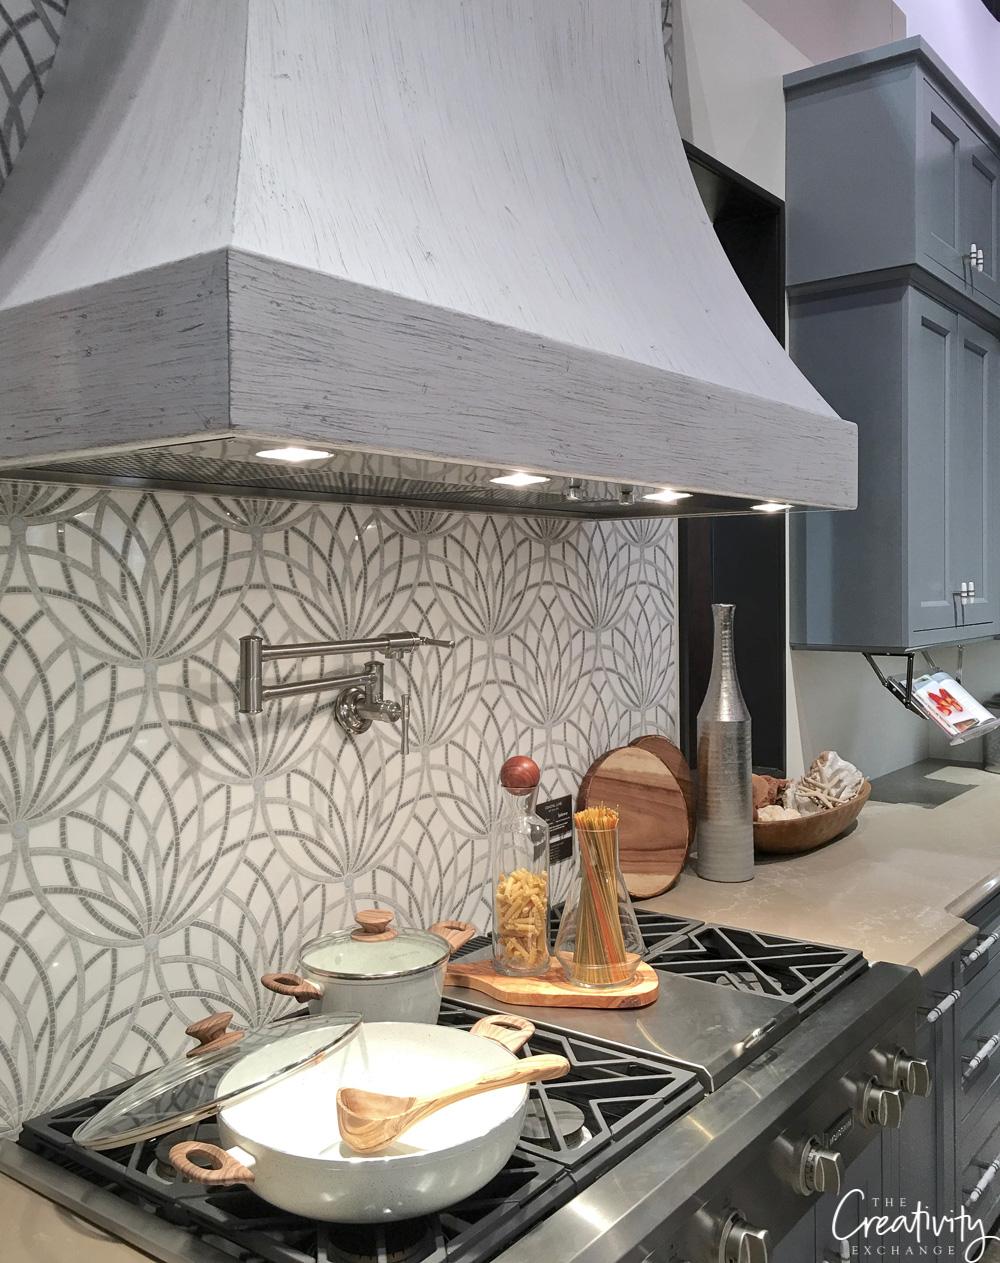 Elkay kitchen with Artistic Tile mosaic backsplash.